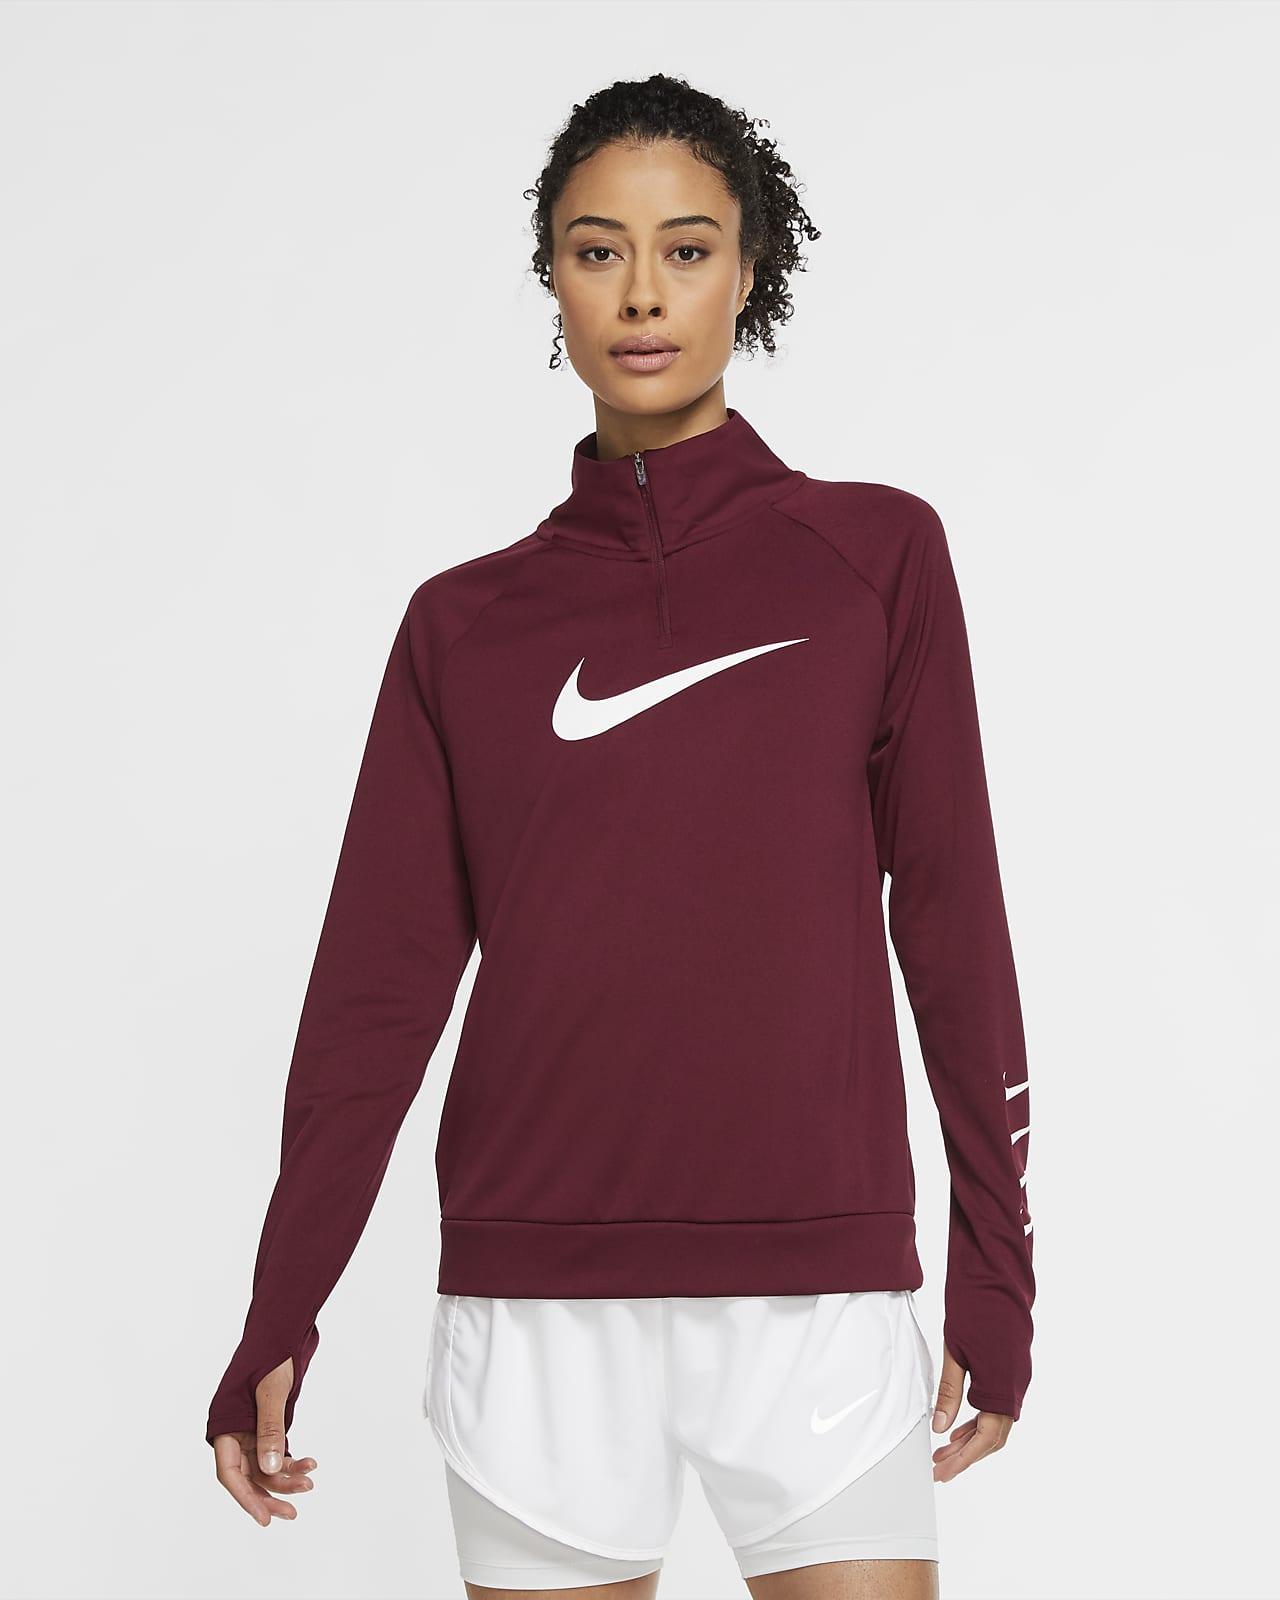 Nike Swoosh Run løpeoverdel med glidelås i halsen til dame